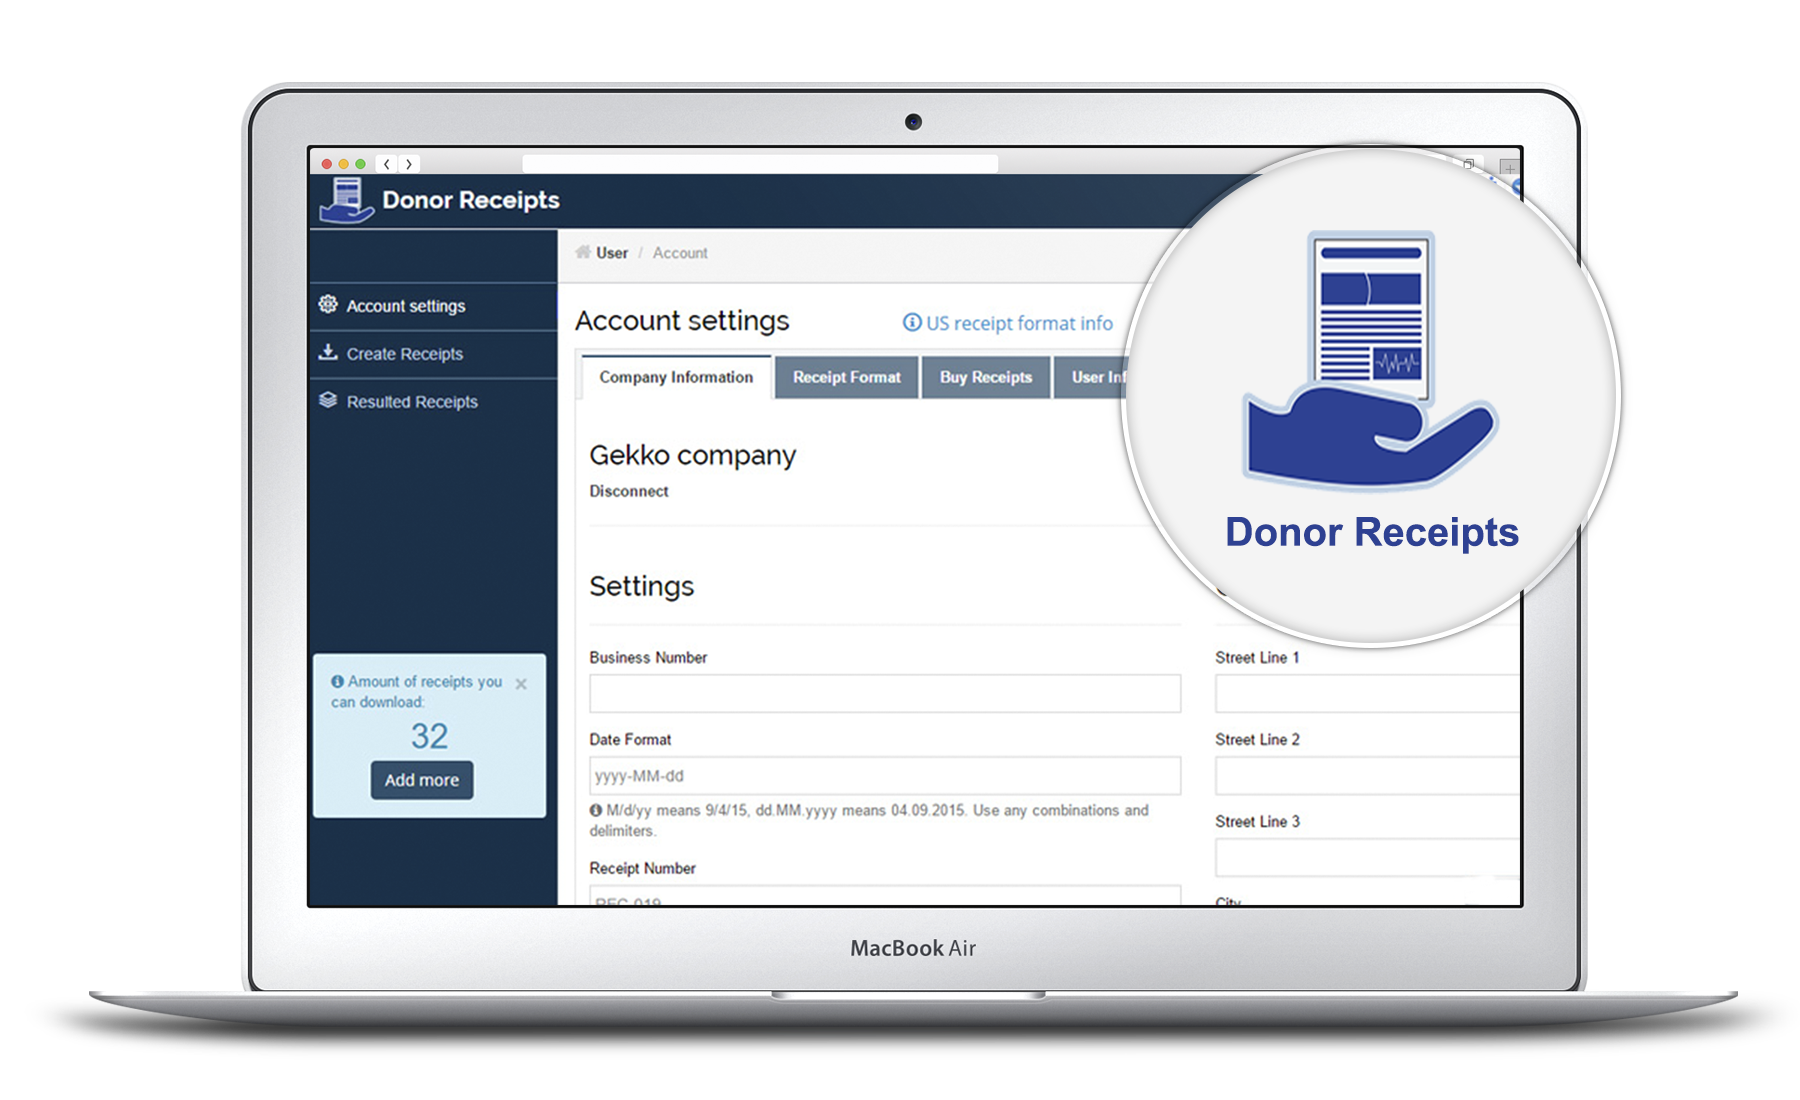 Donor Receipts main